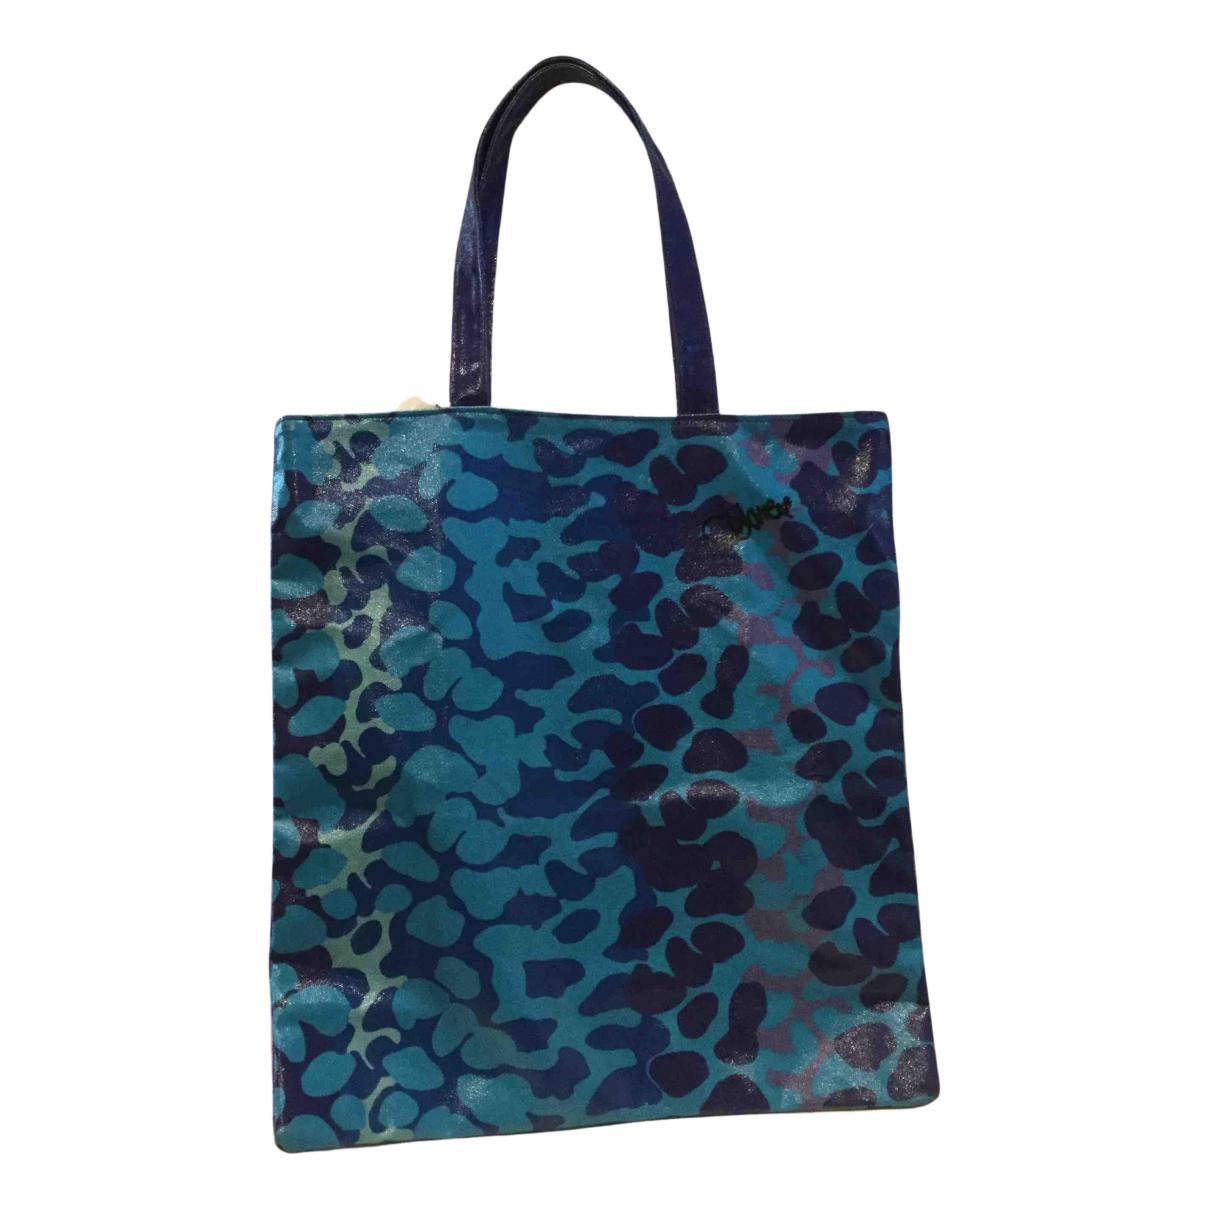 Diane Von Furstenberg N Multicolour Cloth handbag for Women N